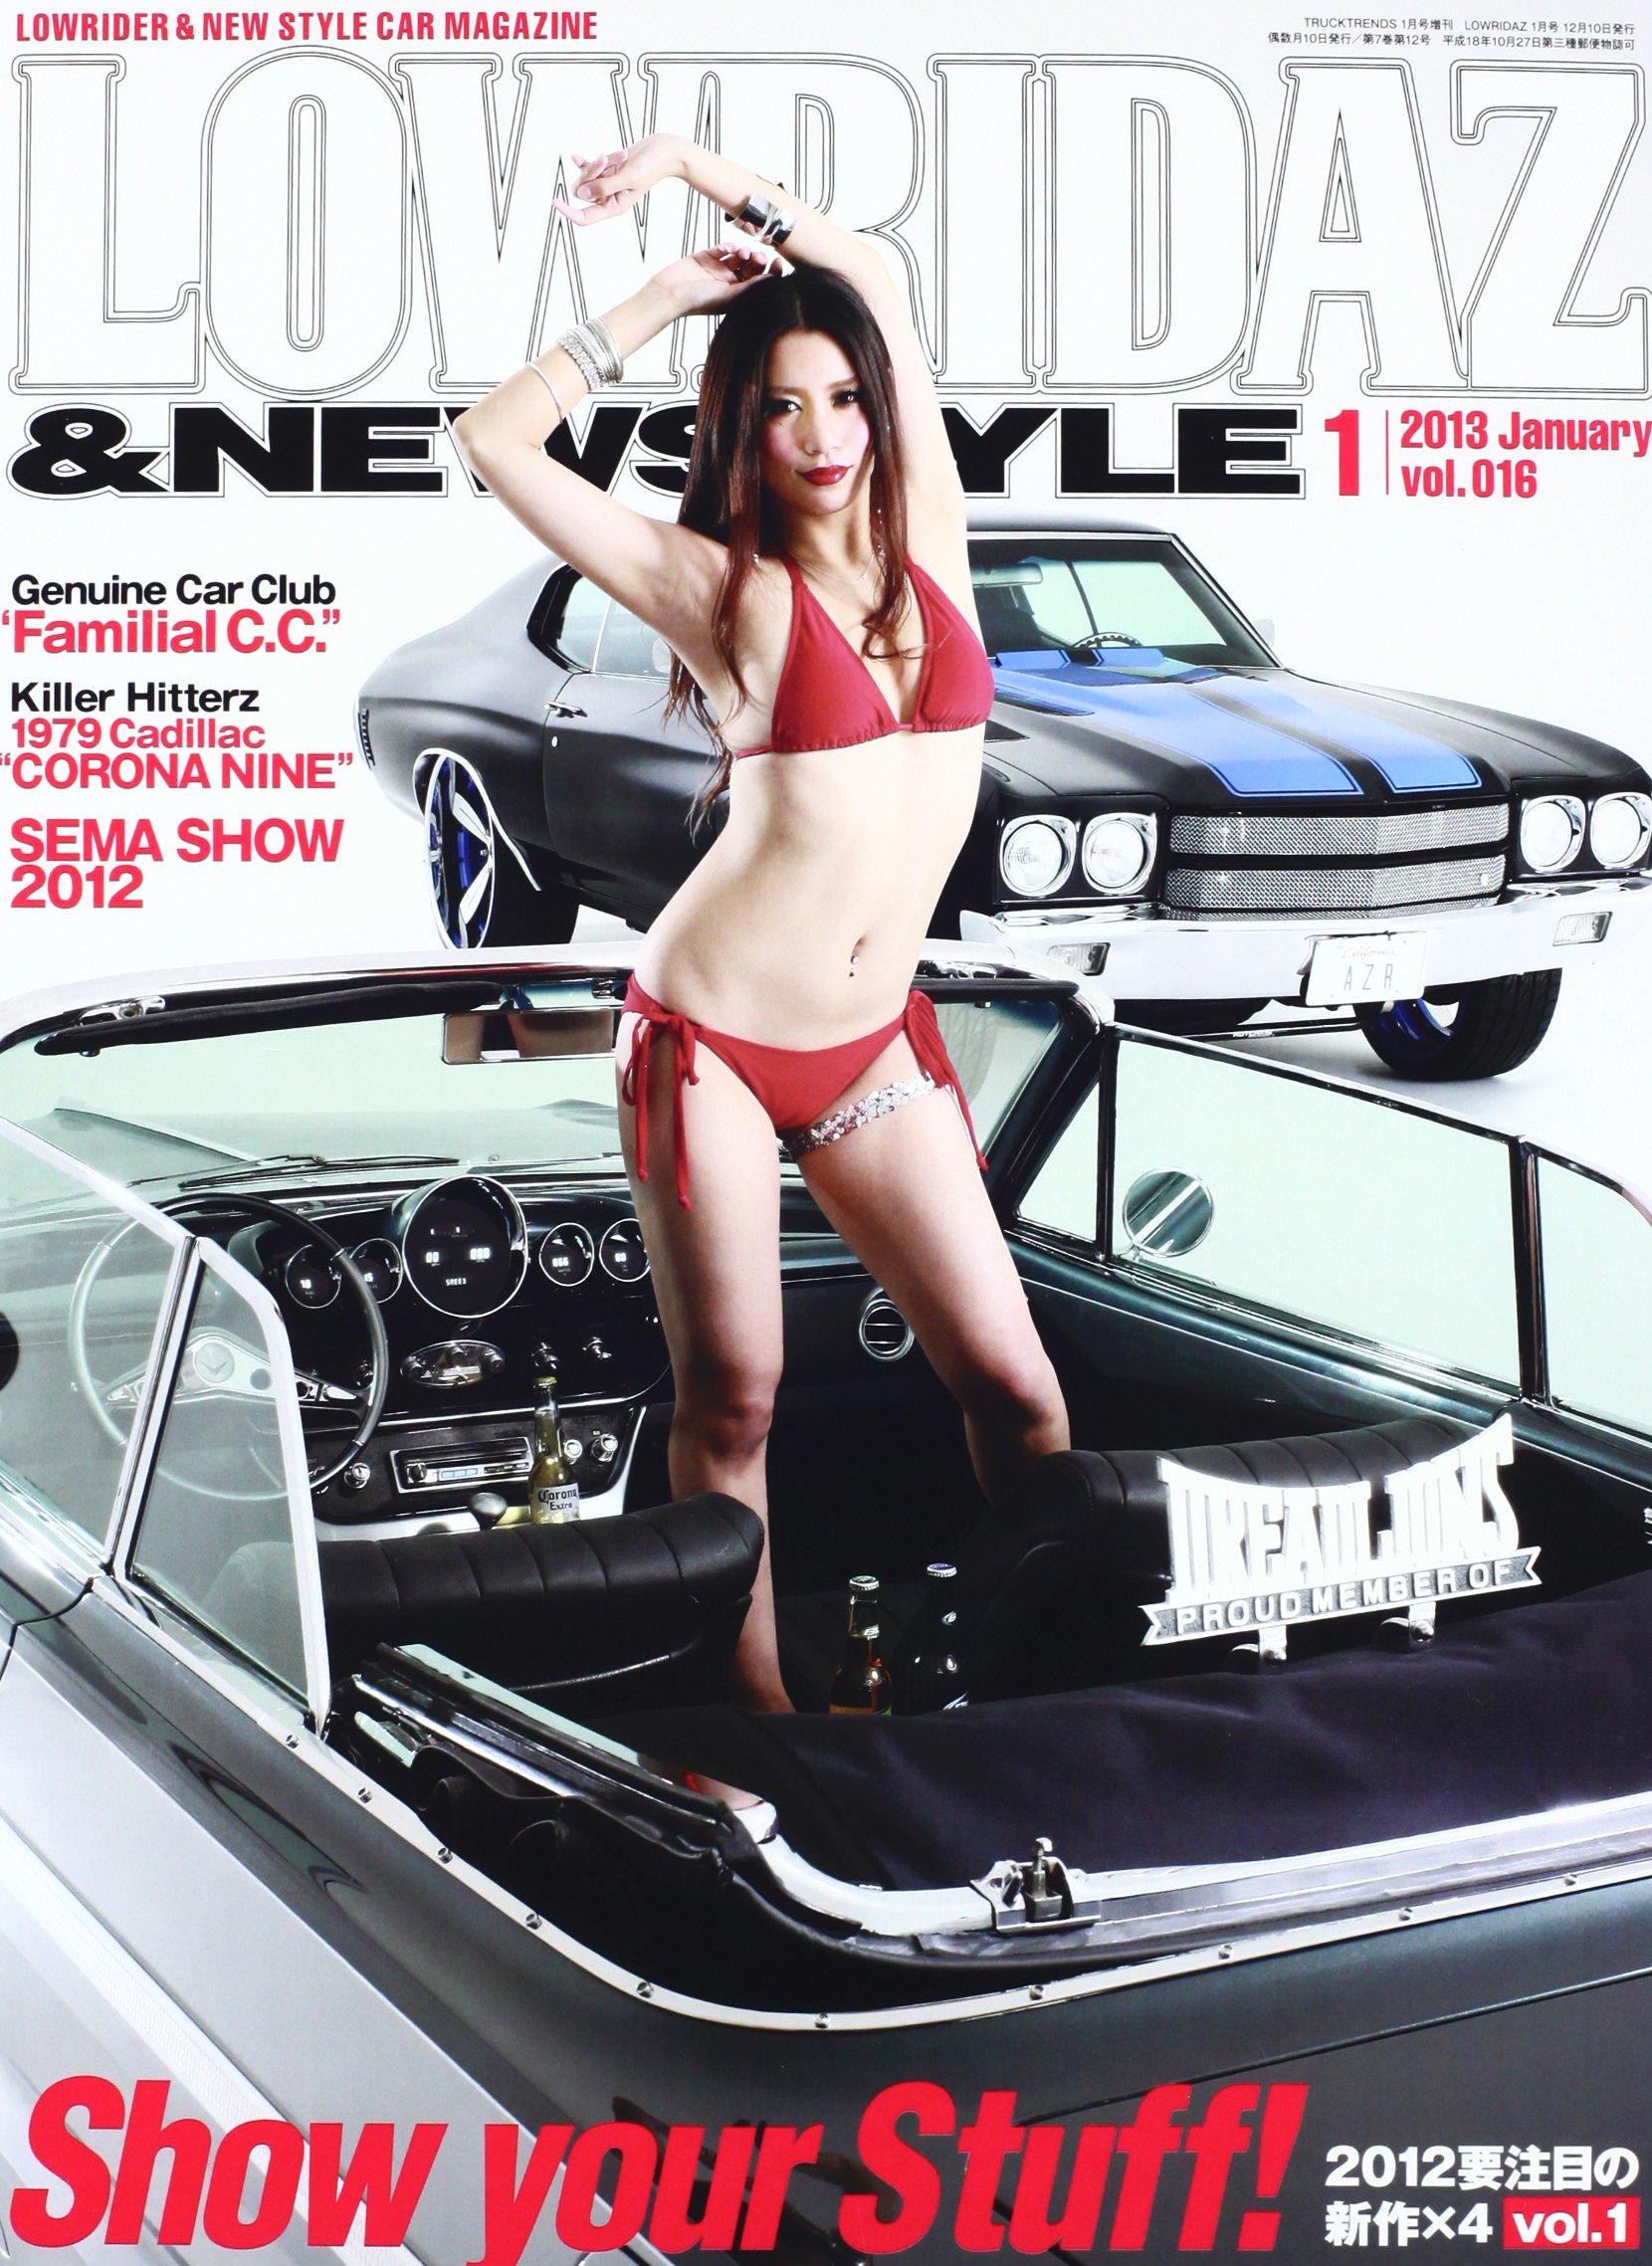 Download Lowridaz & new style magazine Vol. 16 [ January 2013 ] Japan Japnese Lowrider Magazine ebook